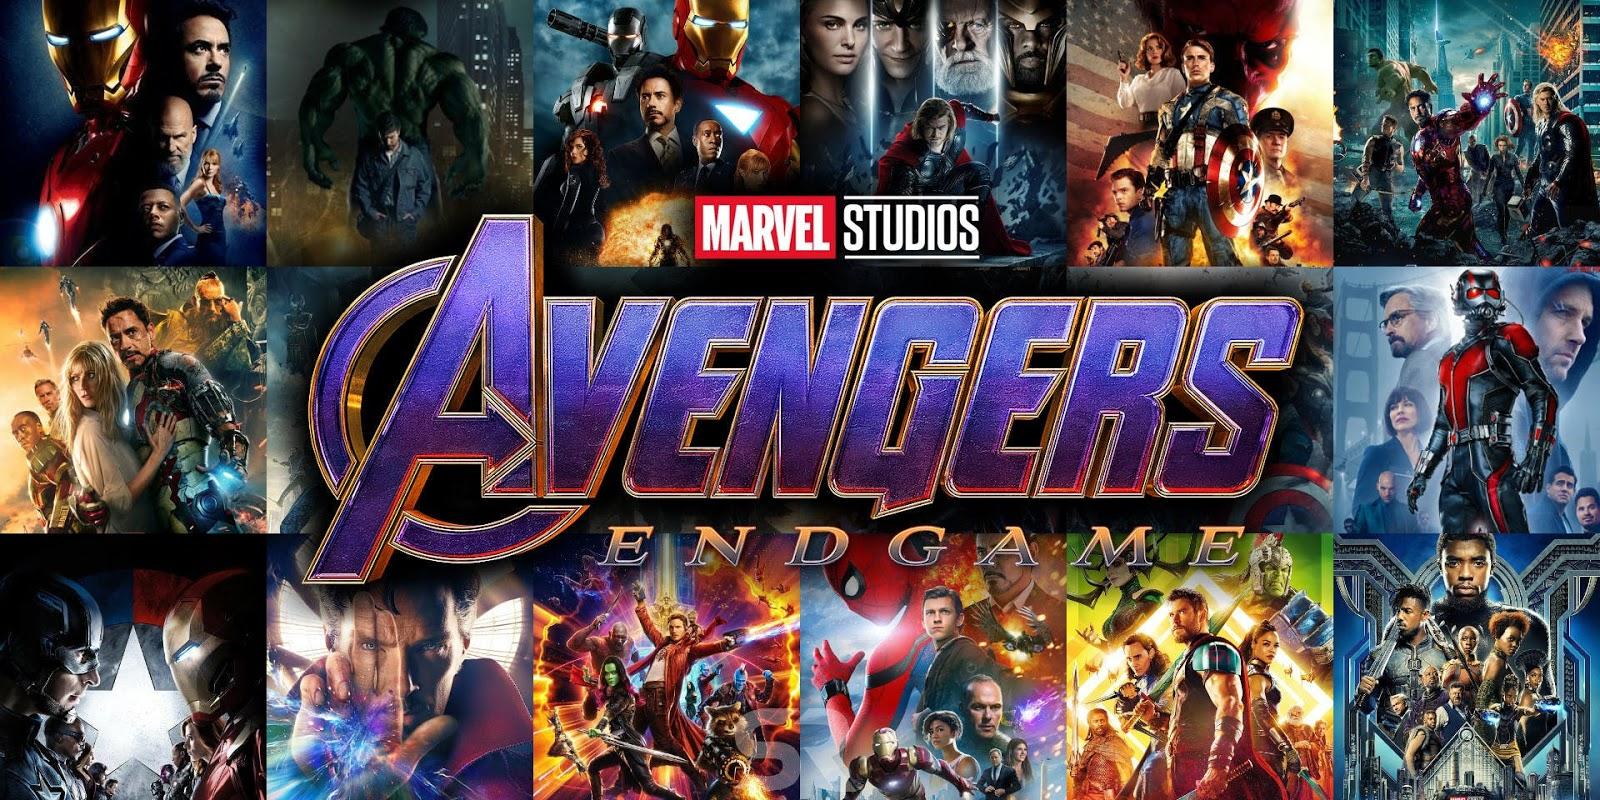 Menyejukkan Beginilah Cara Fans Marvel Yang Tuna Netra Ini Menikmati Avengers Endgame Bertajuk Com